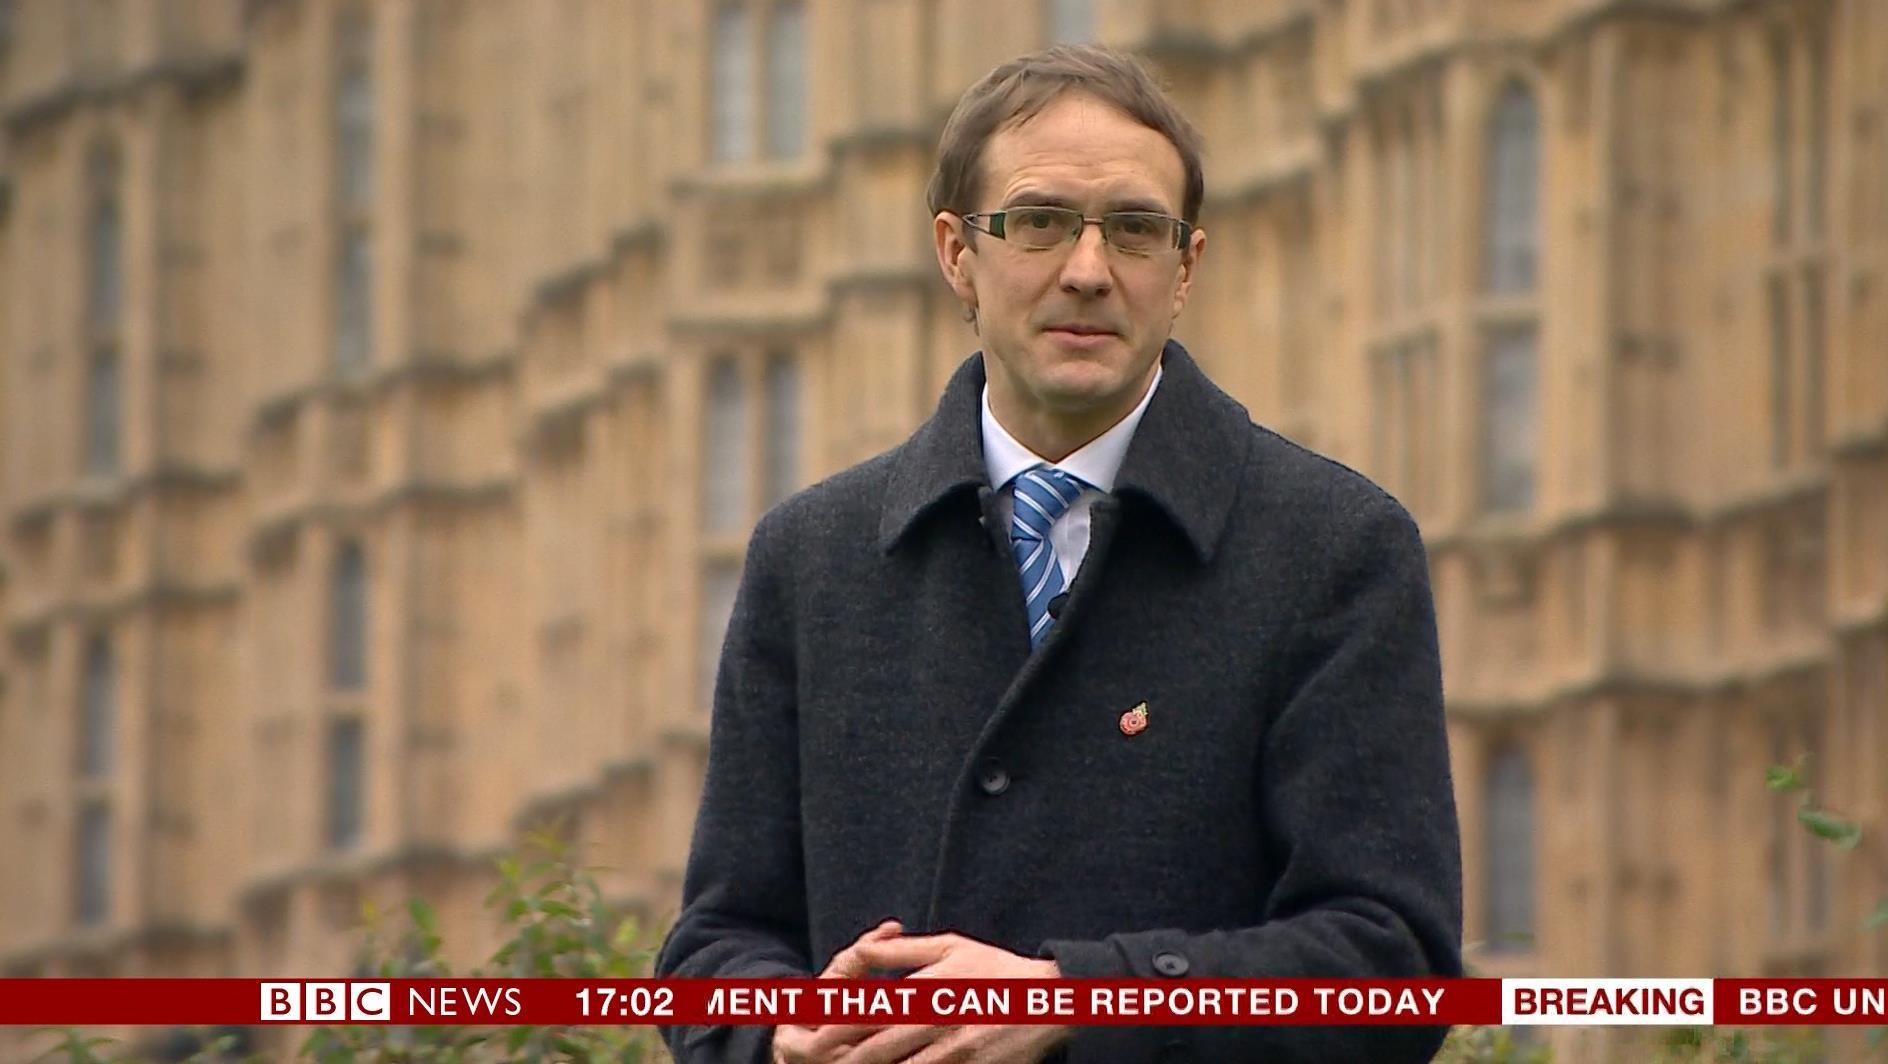 Chris Mason - BBC News Reporter (2)